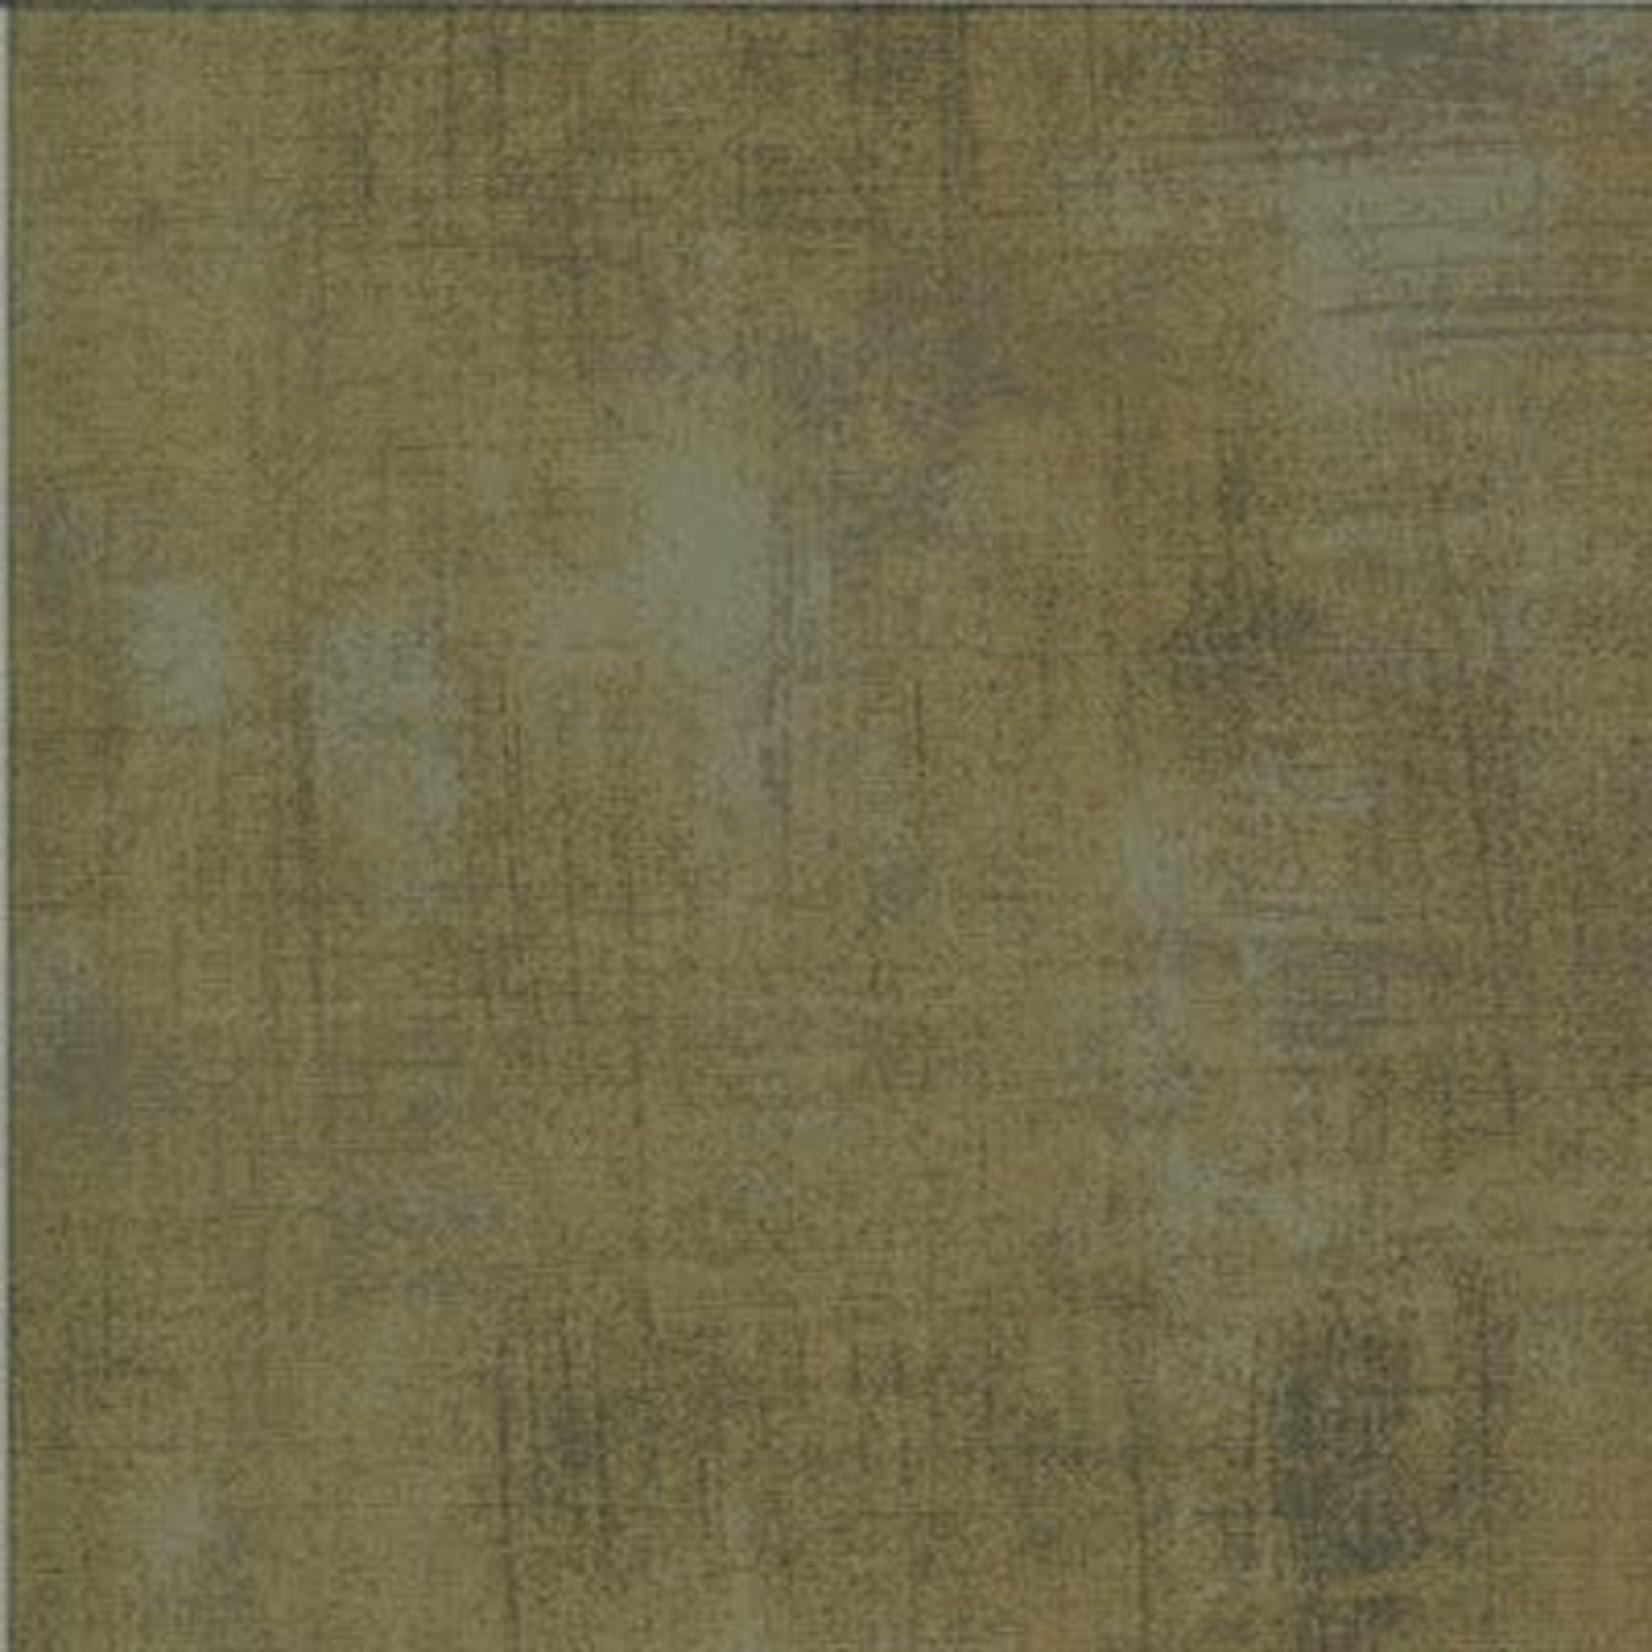 Moda Grunge Basics Grunge - Golden Delicious Tart per cm or $20/m